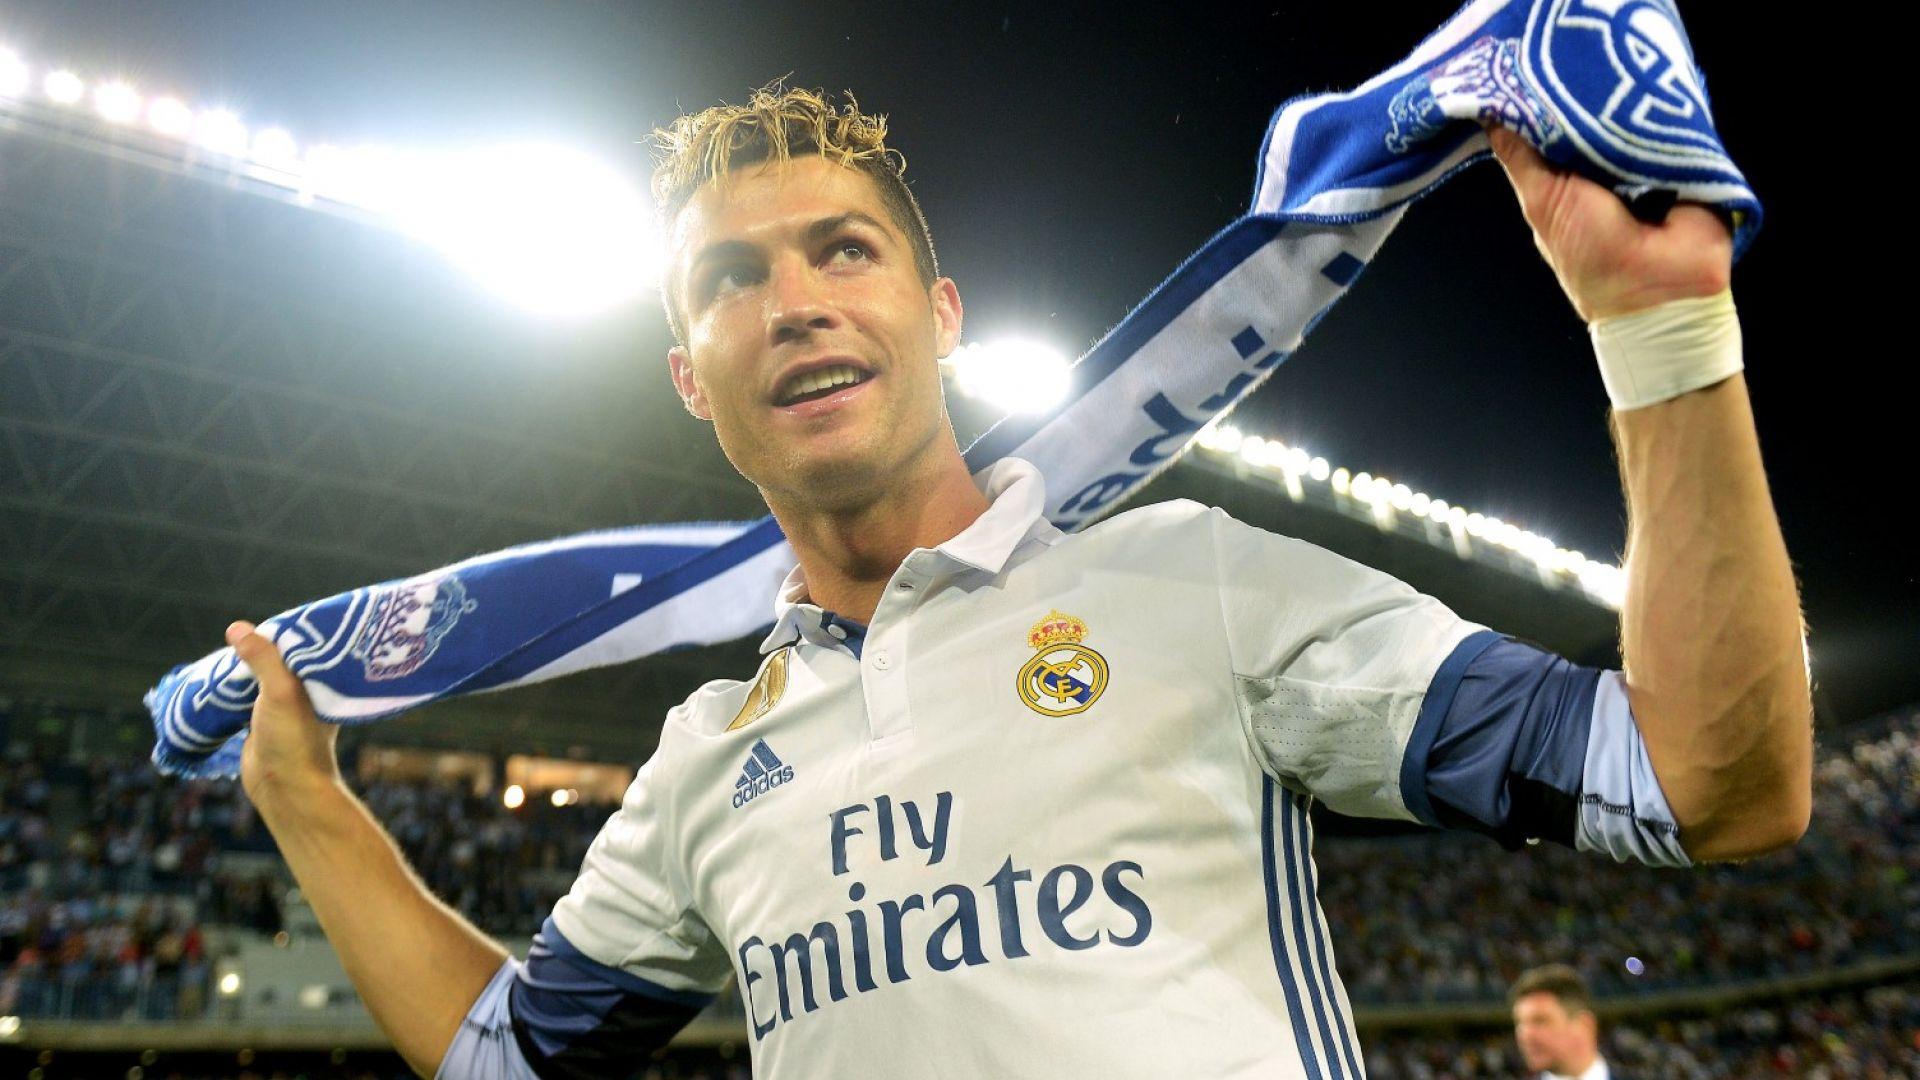 Португалска медия намеси Реал Мадрид в скандала с Роналдо